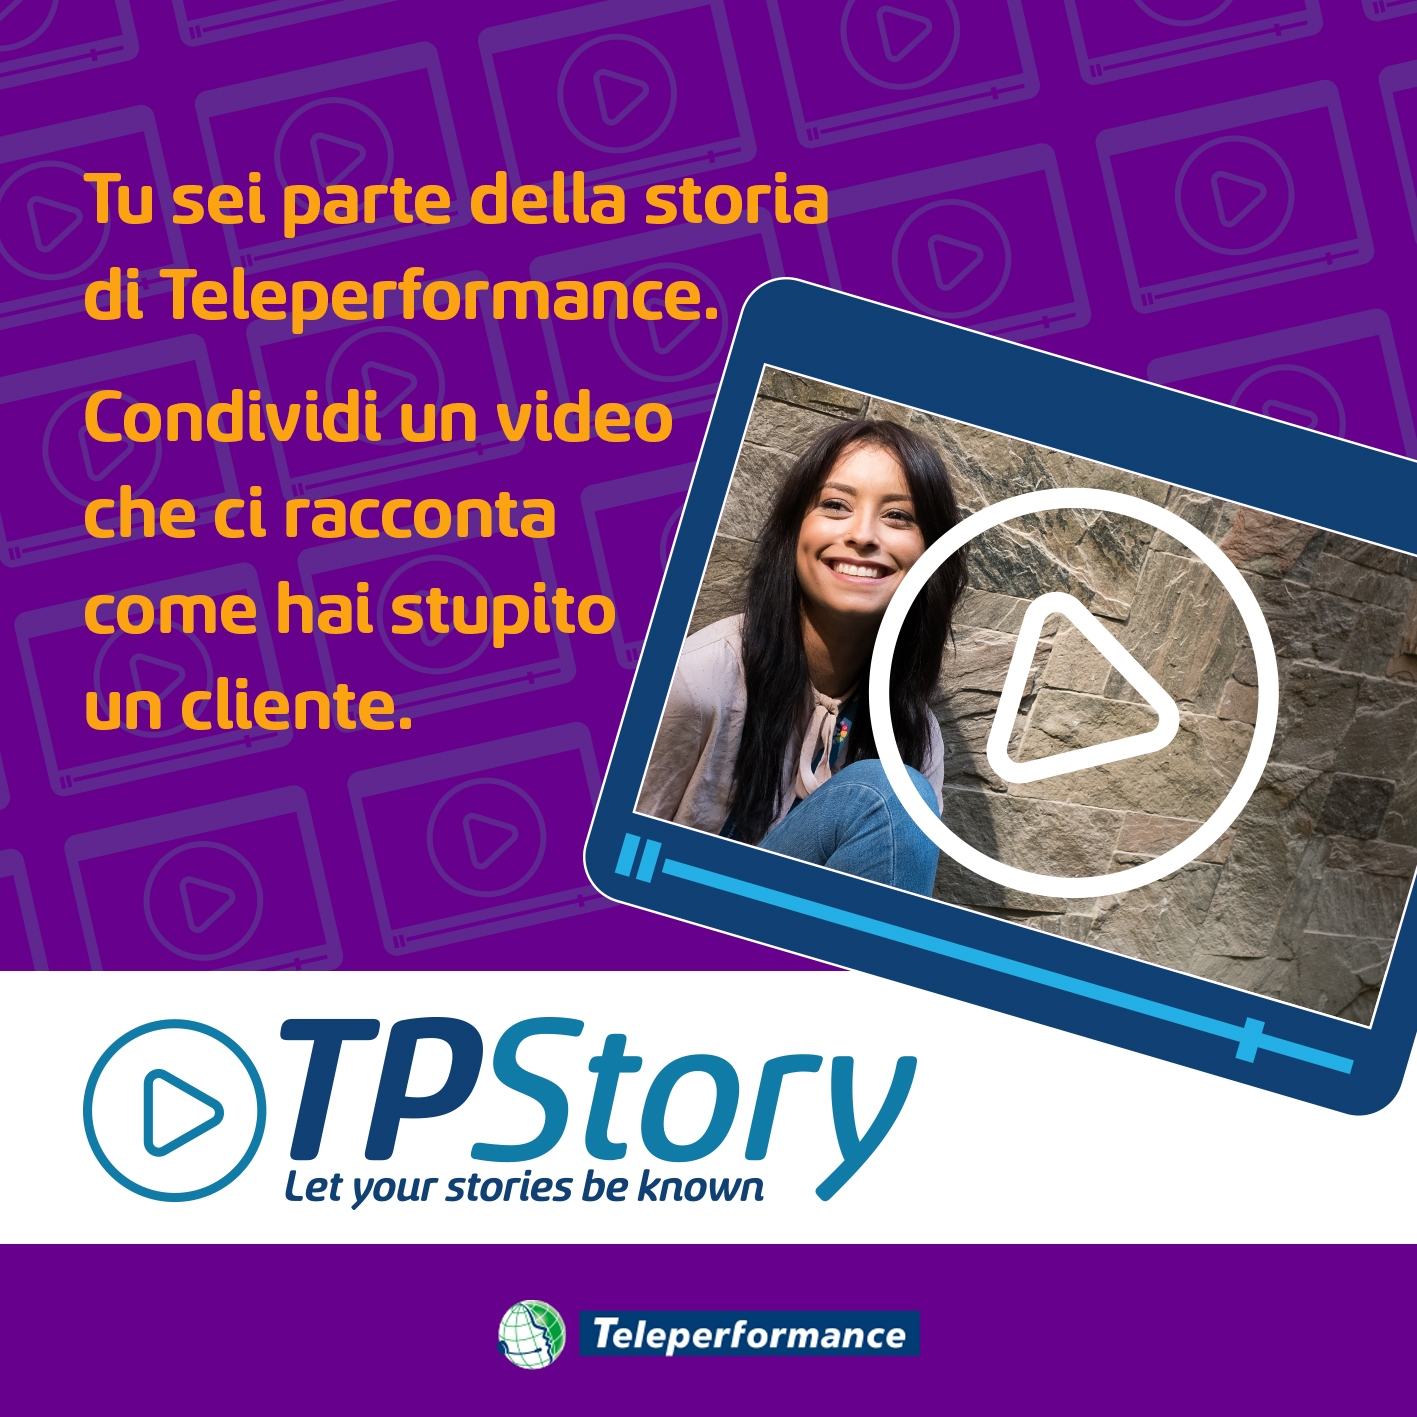 TpStory-Facebook1